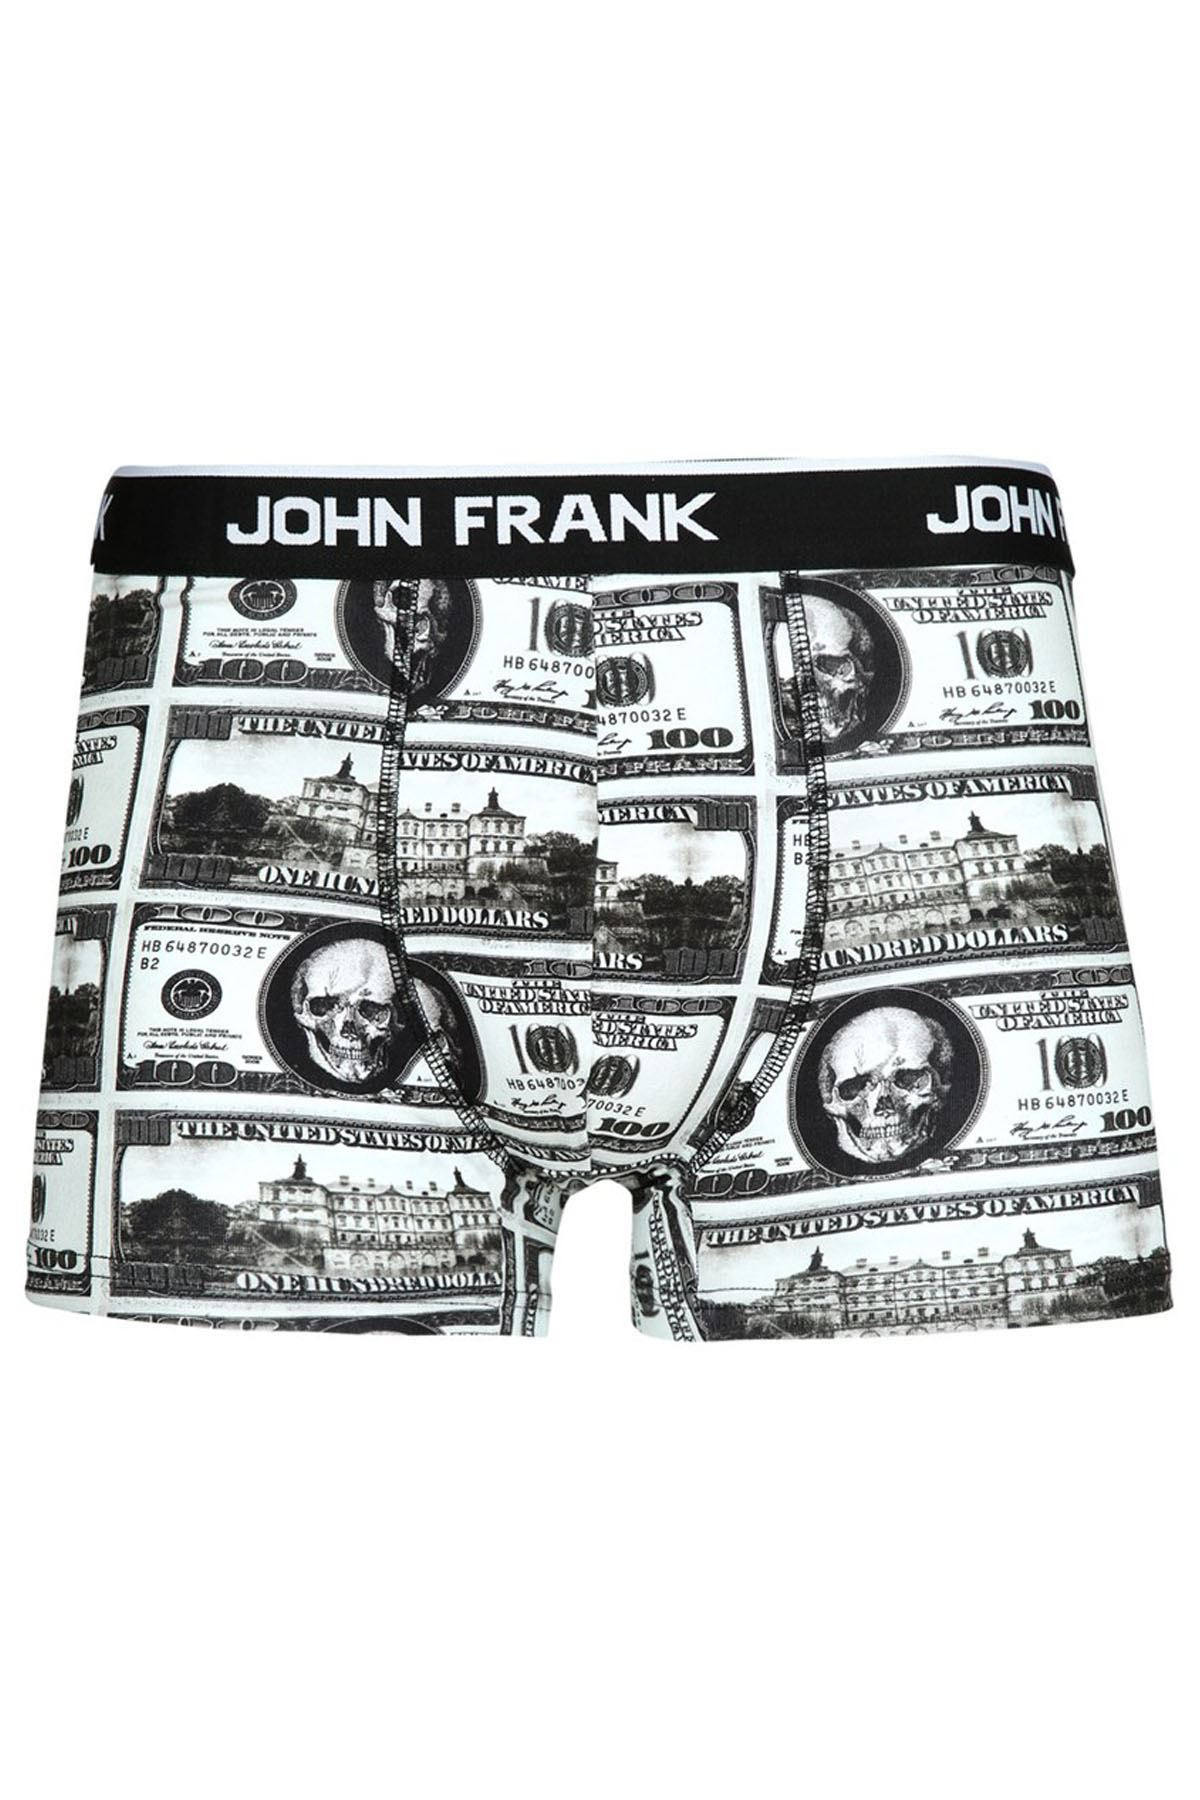 JOHN FRANK JFB72 DOLAR DİJİTAL BASKILI ERKEK BOXER KARMA DESENLİ